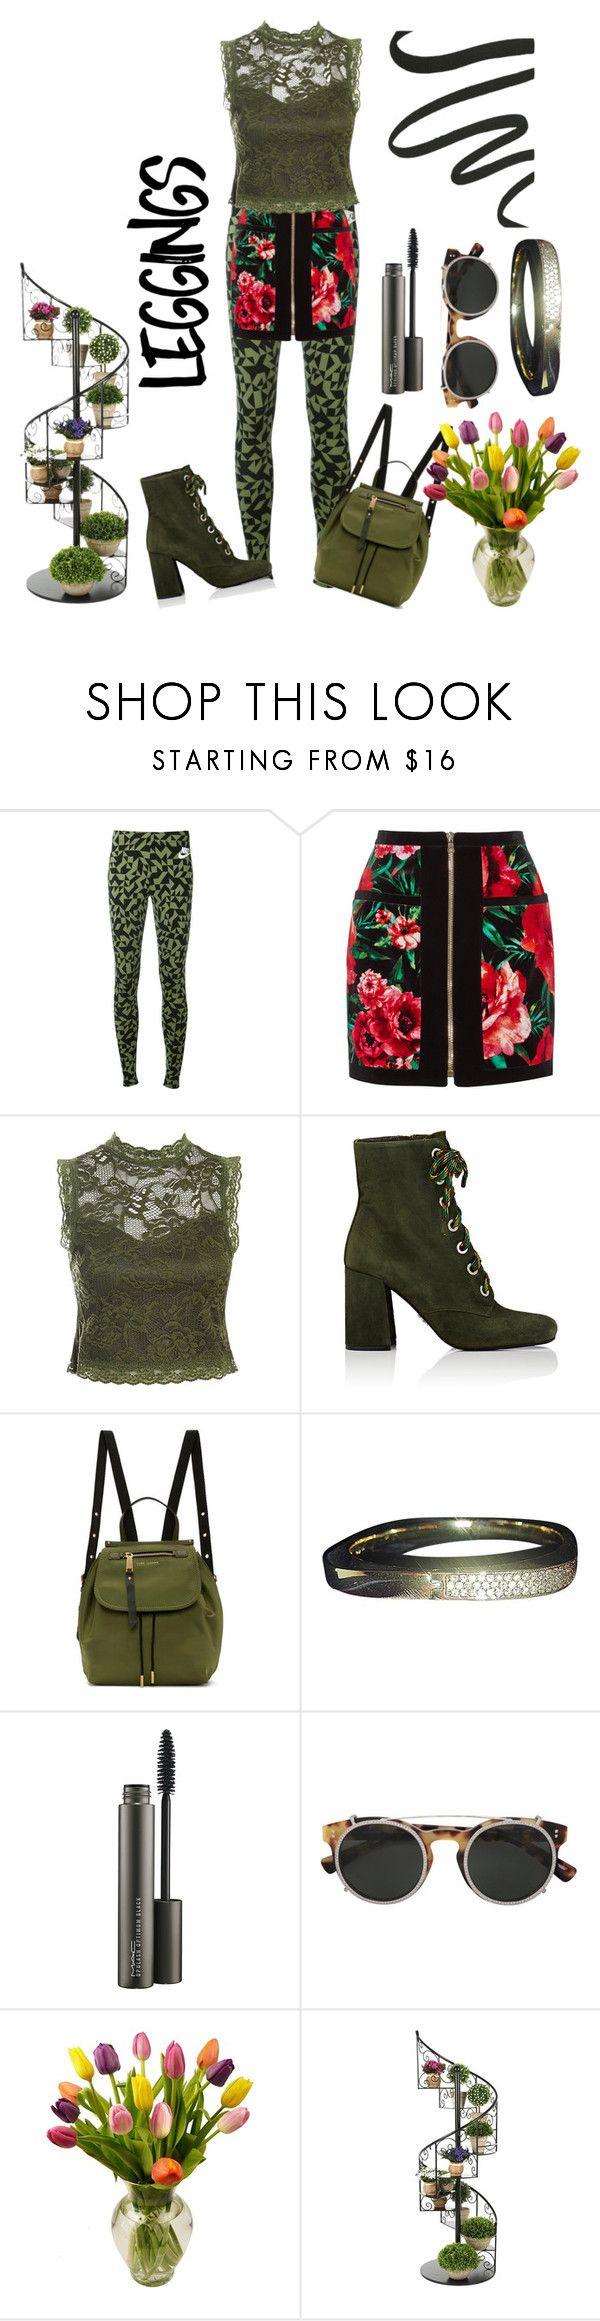 """leggings with skirt"" by priyaarun ❤ liked on Polyvore featuring NIKE, Balmain, Sans Souci, Prada, Marc Jacobs, Swarovski, MAC Cosmetics, Valentino and Laura Mercier"